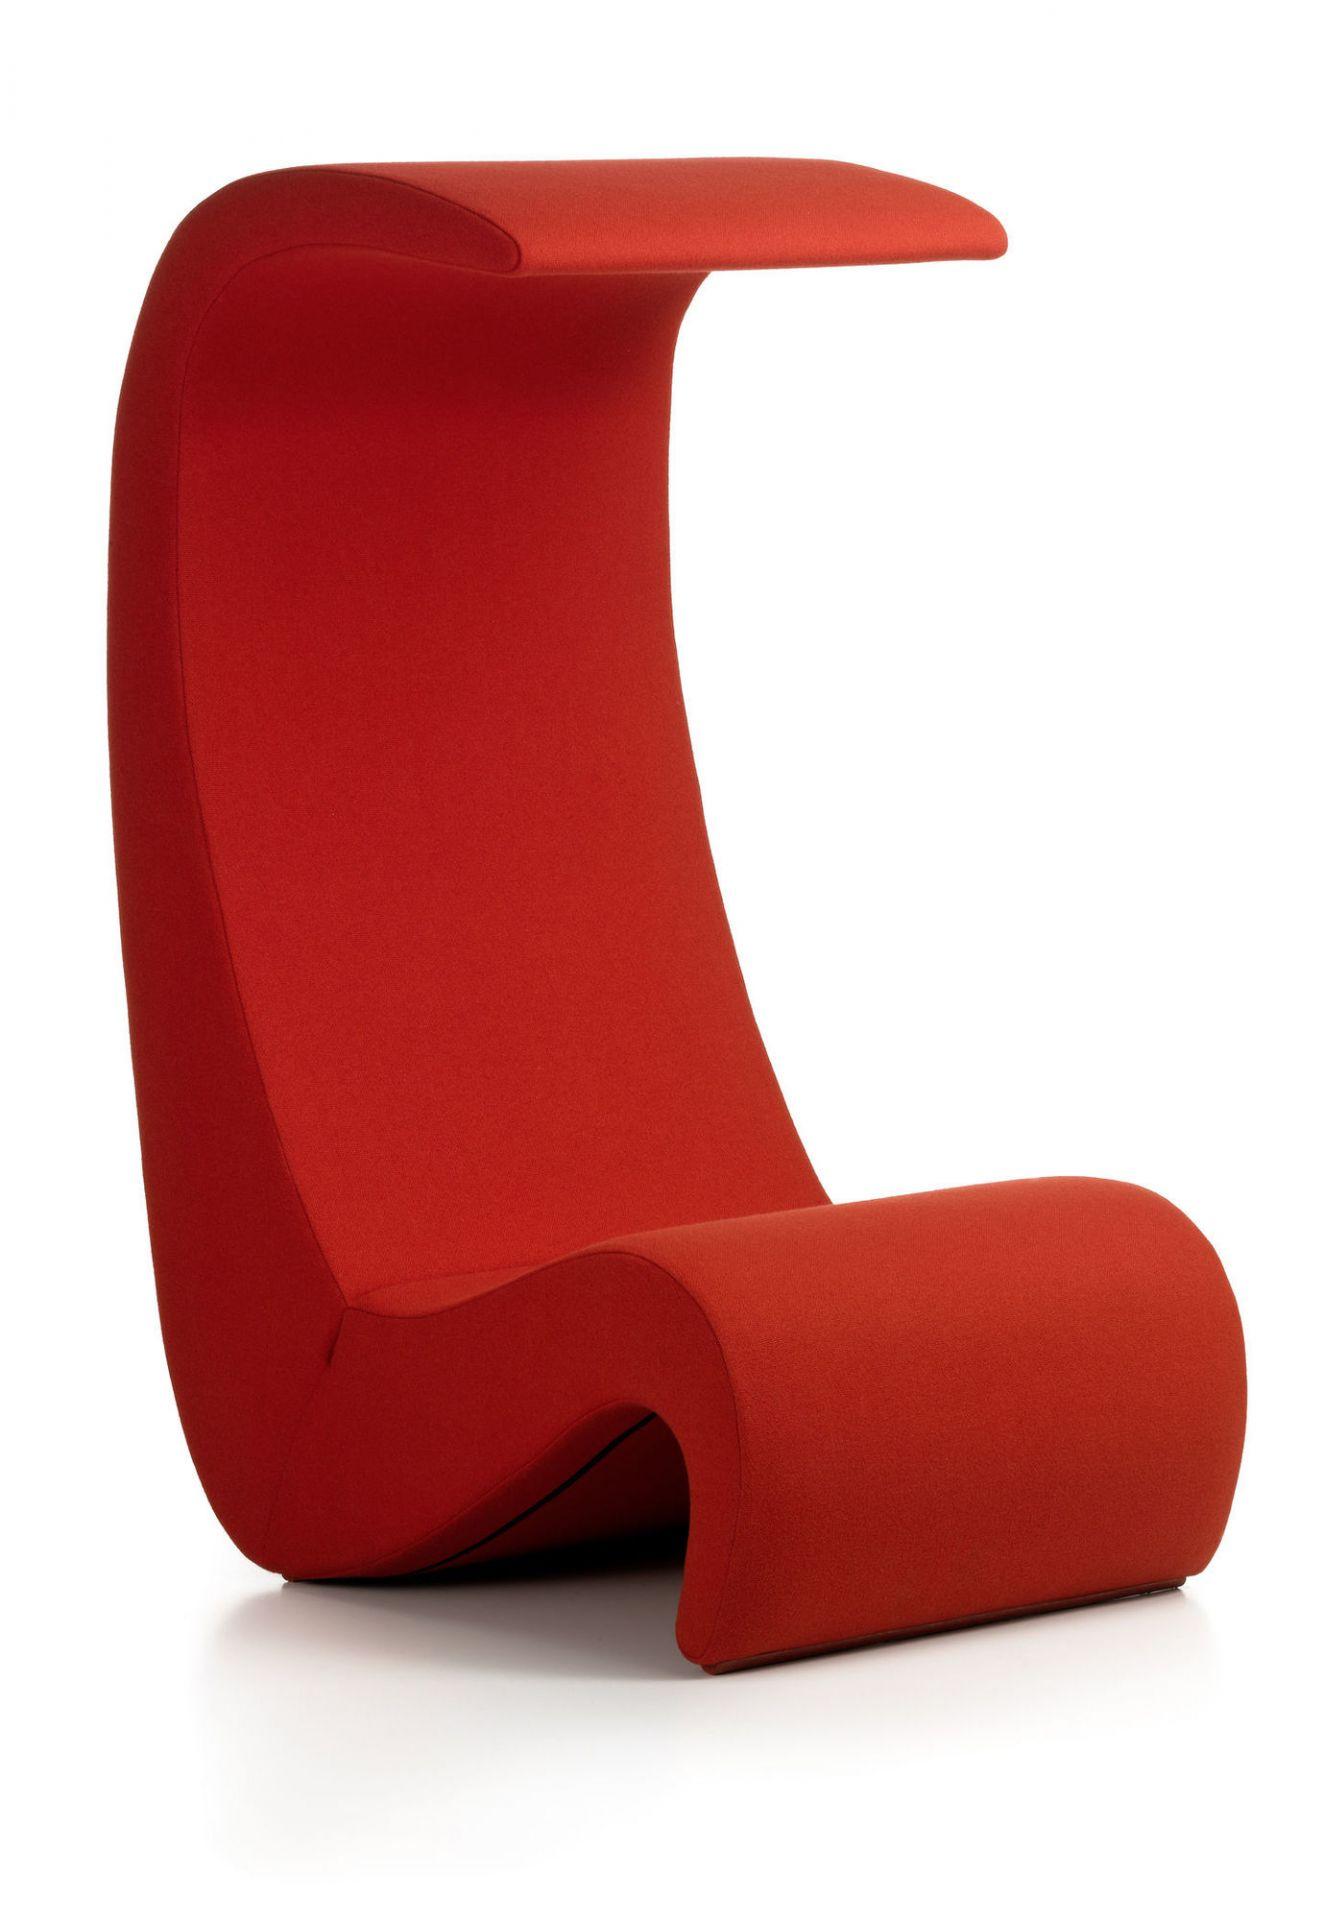 Amoebe Highback Sessel Vitra